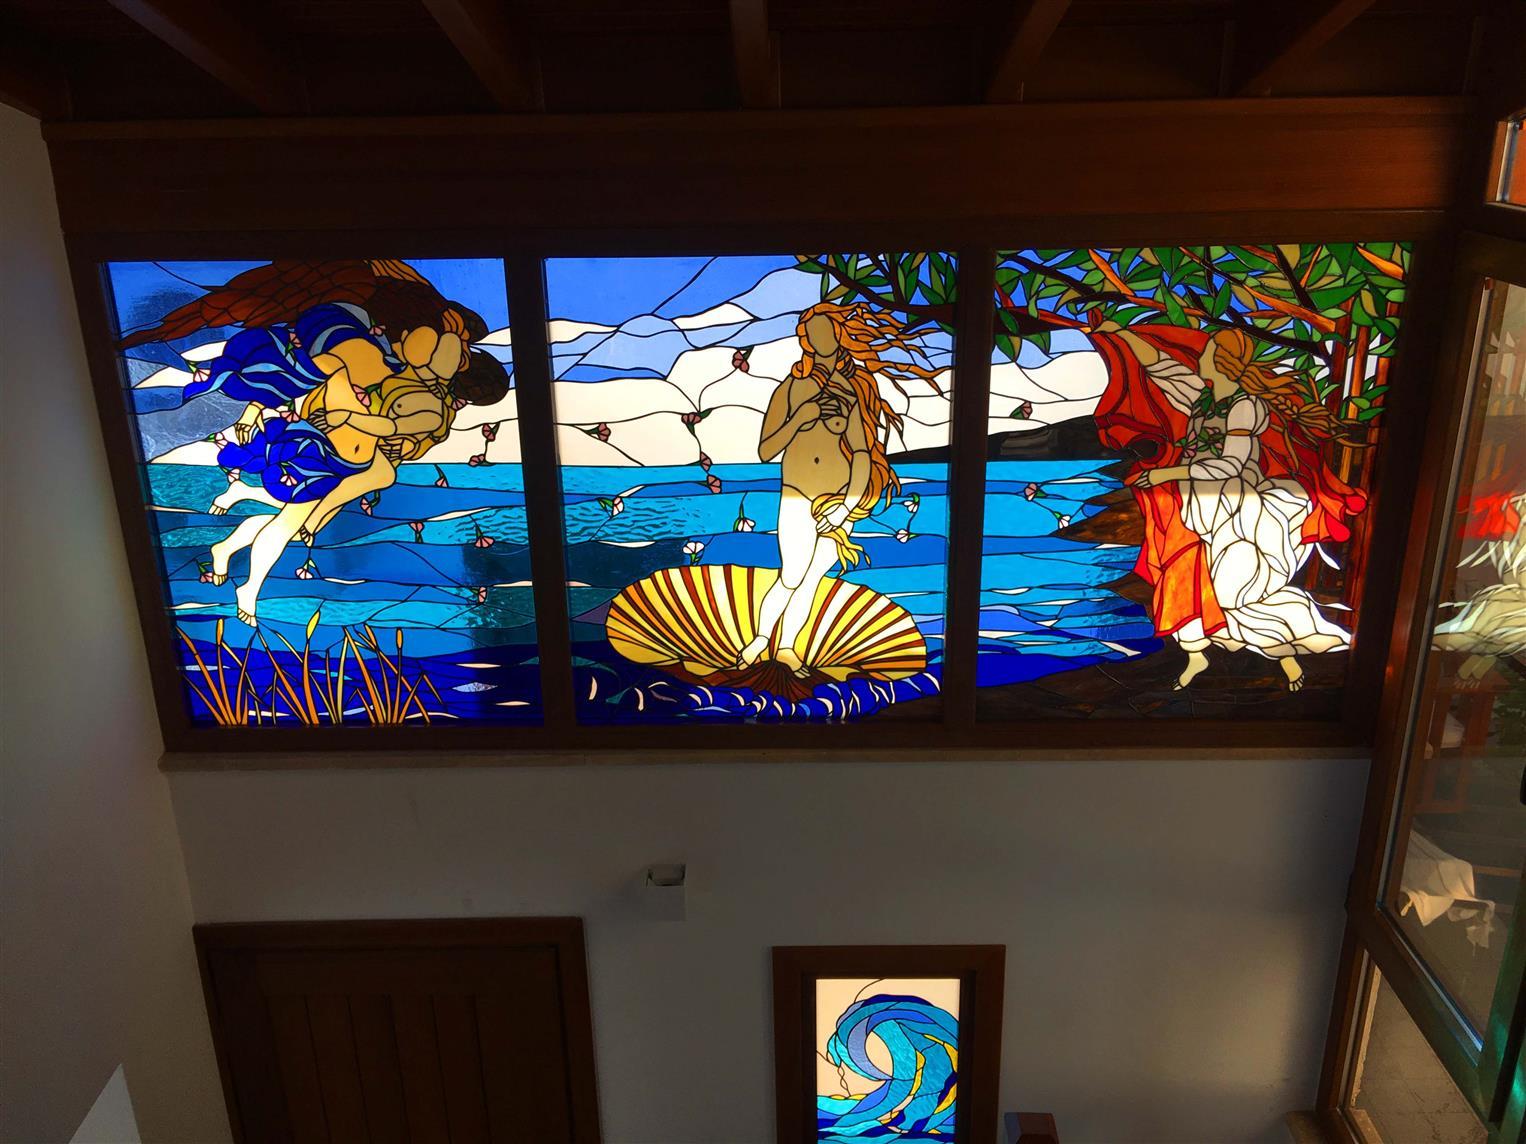 venusun-dogusu-sandro-botticelli-vitray-uyarlamasi-datca-mugla-villa2020120162211740.jpg izmir vitray çalışması